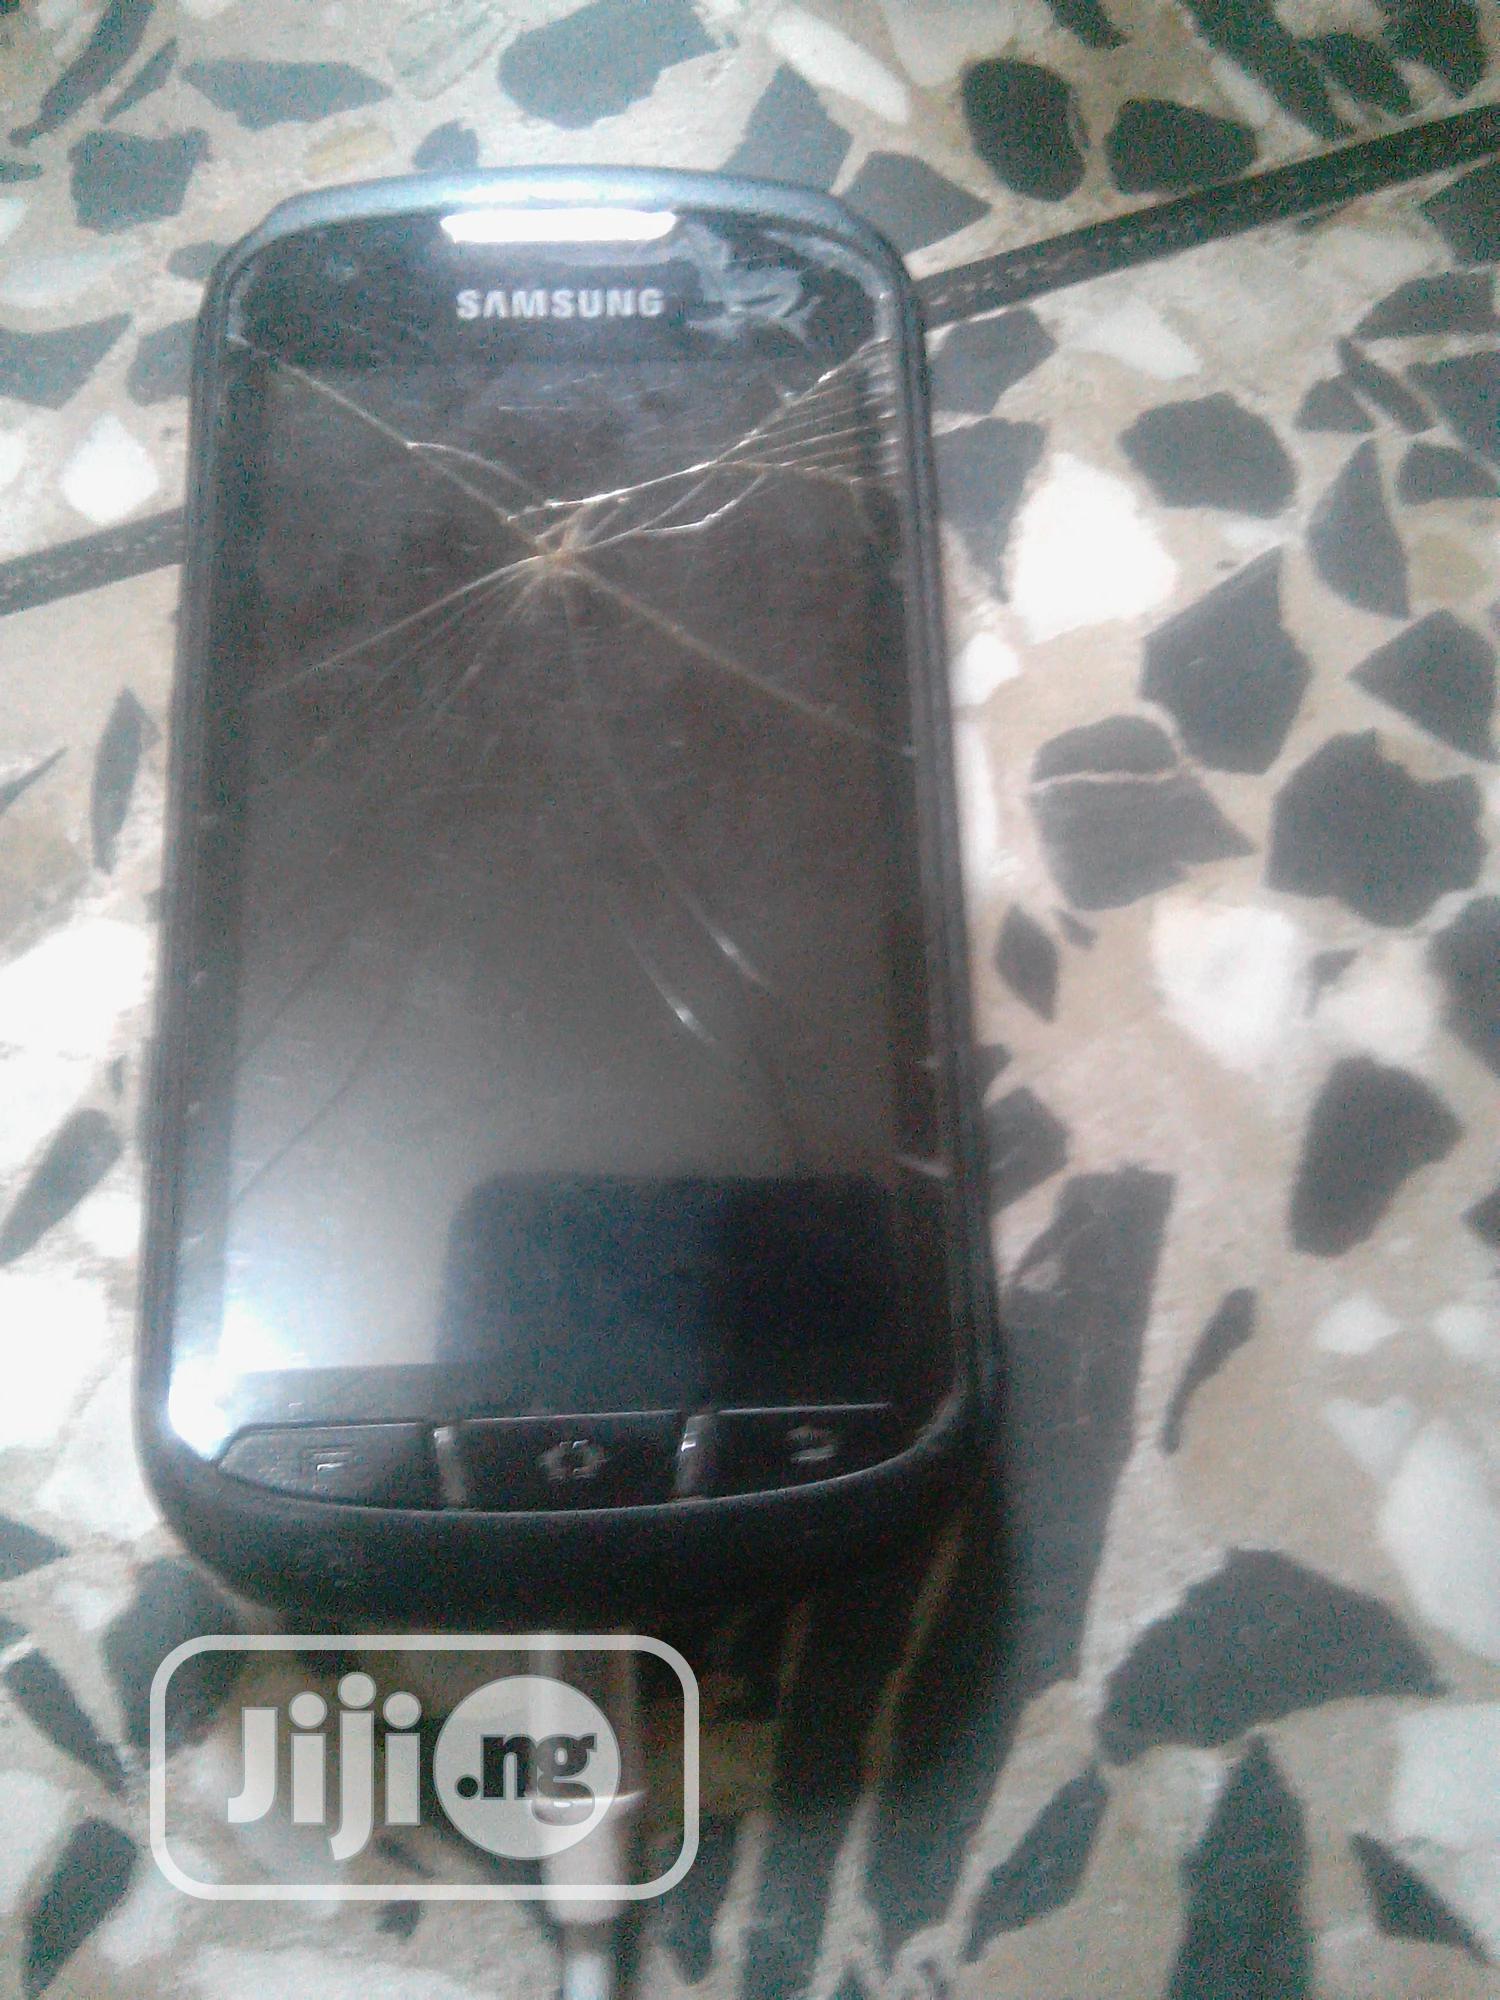 Archive: Samsung S7710 Galaxy Xcover 2 4 GB Black